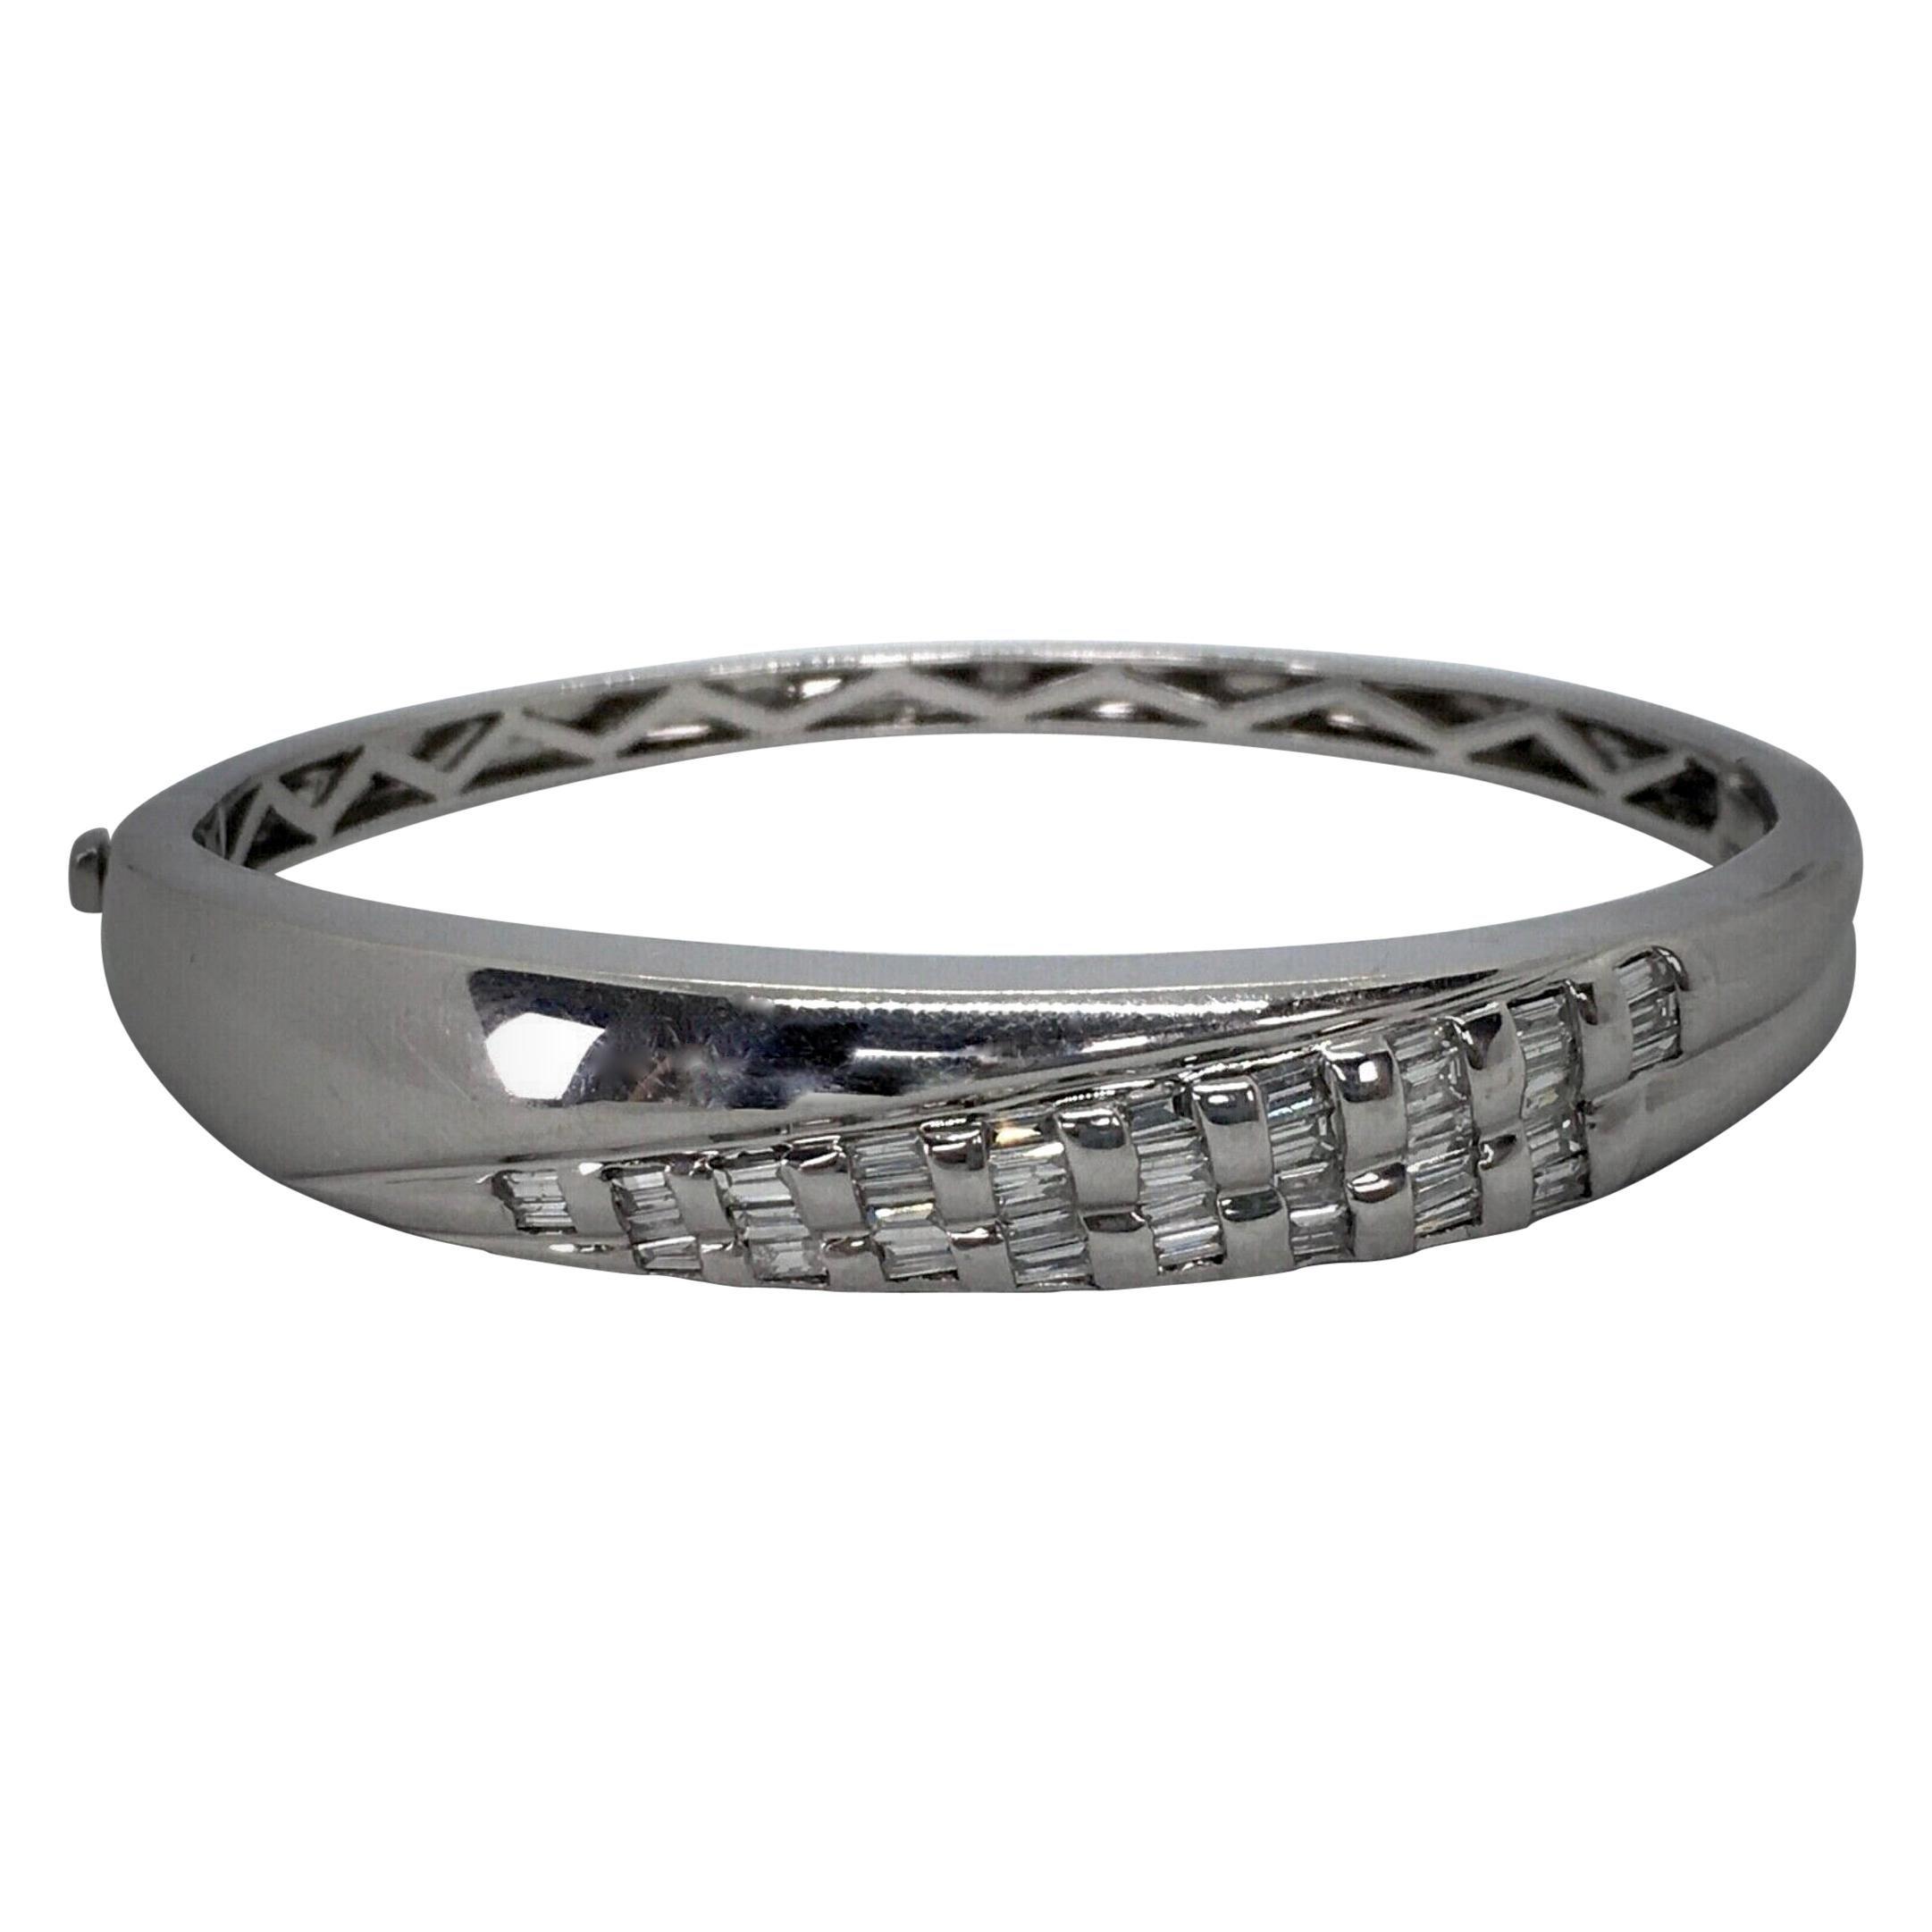 Diamond Baguette Cuff Bracelet 18 Karat White Gold 36.3g